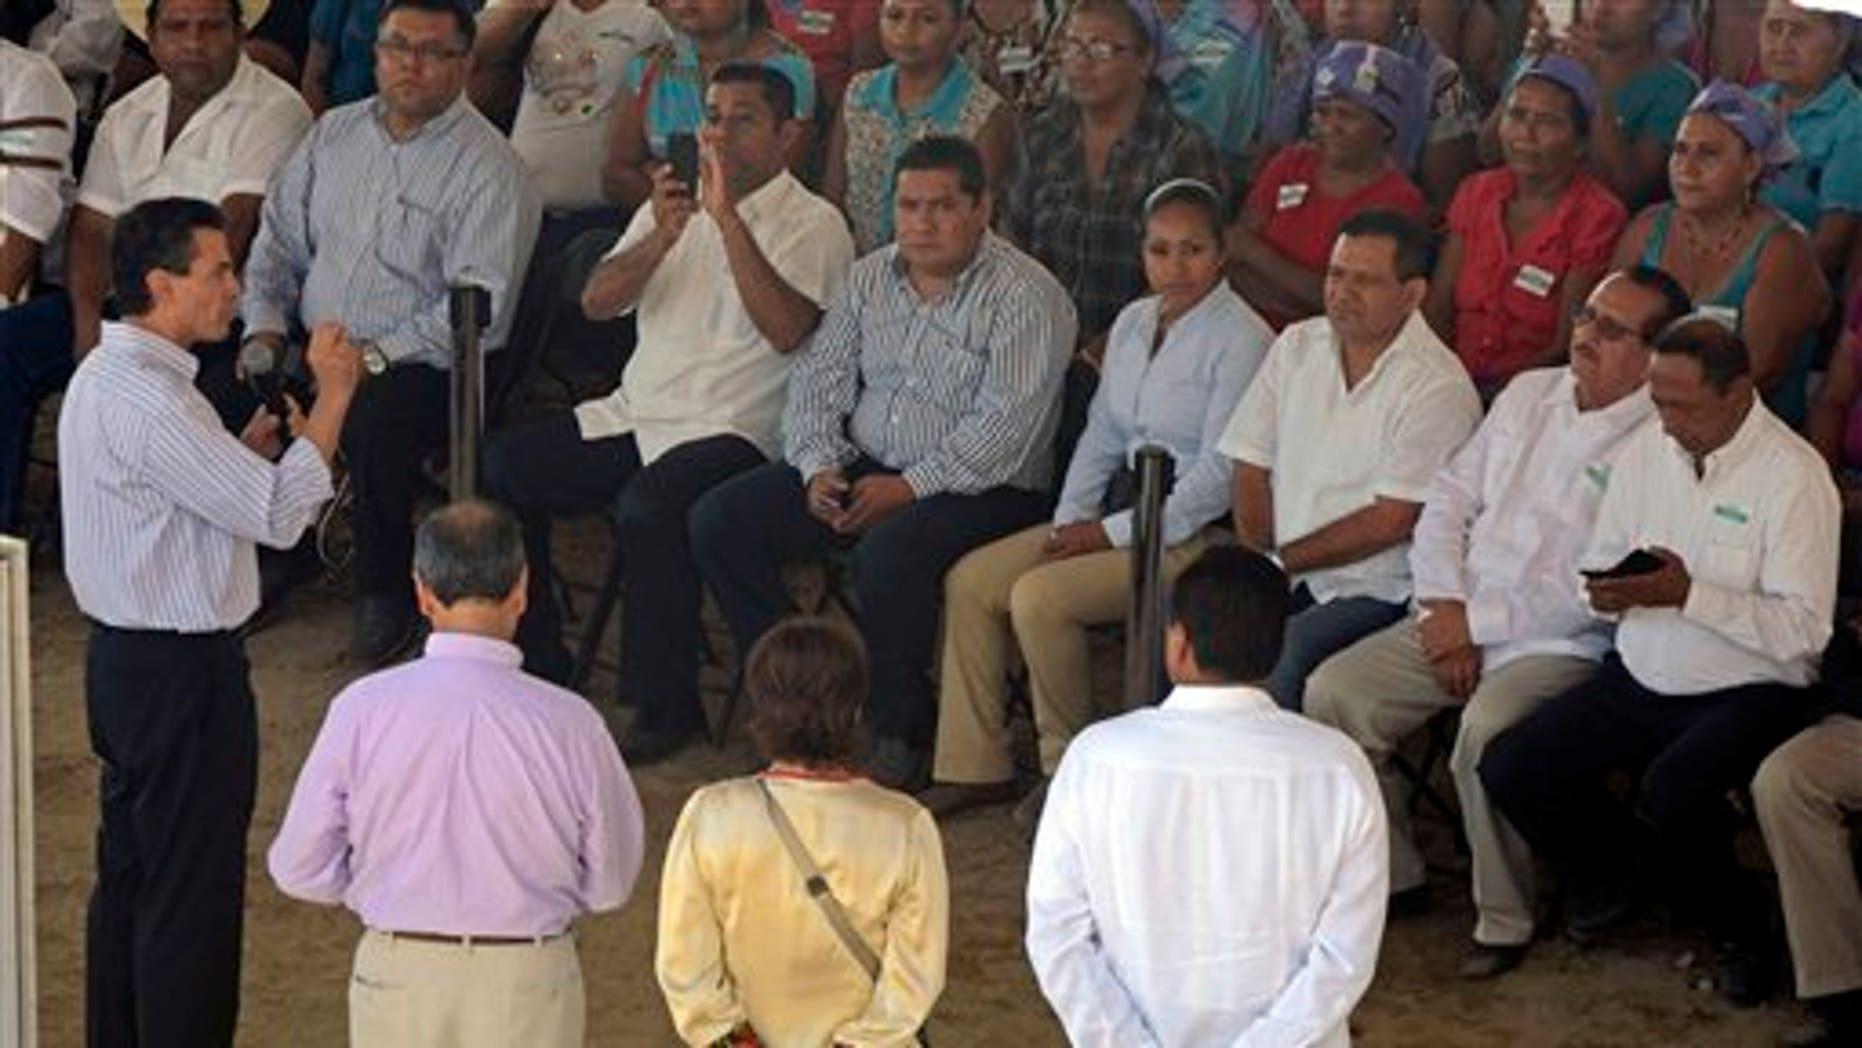 Mexico's President Enrique Peña Nieto speaks to the audience in Coyuca de Benitez in the state of Guerrero, on Dec. 4, 2014.